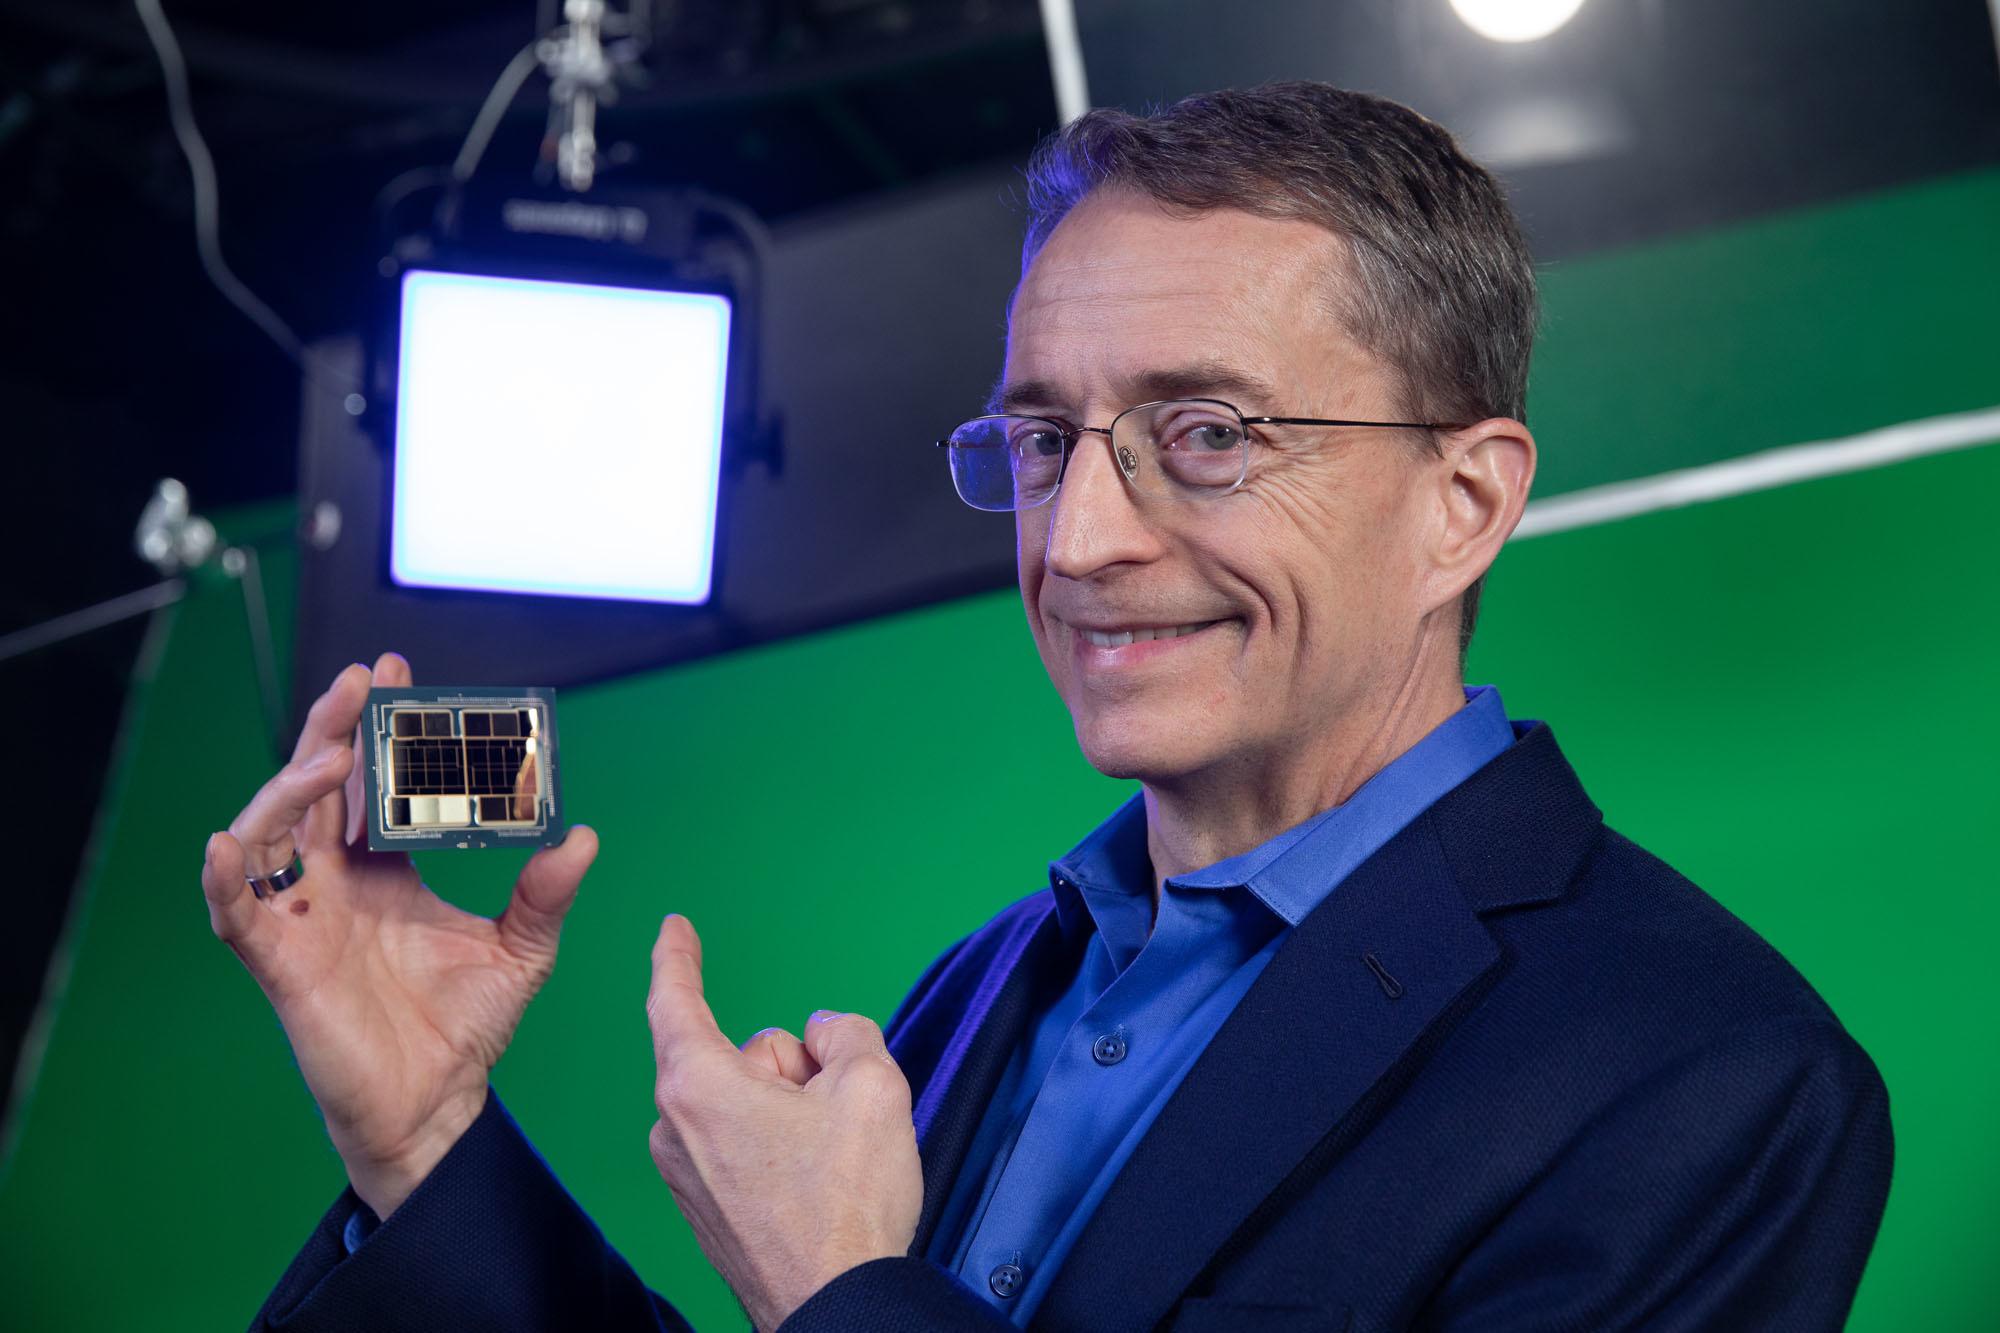 Intel CEO Pat Gelsinger, Intel